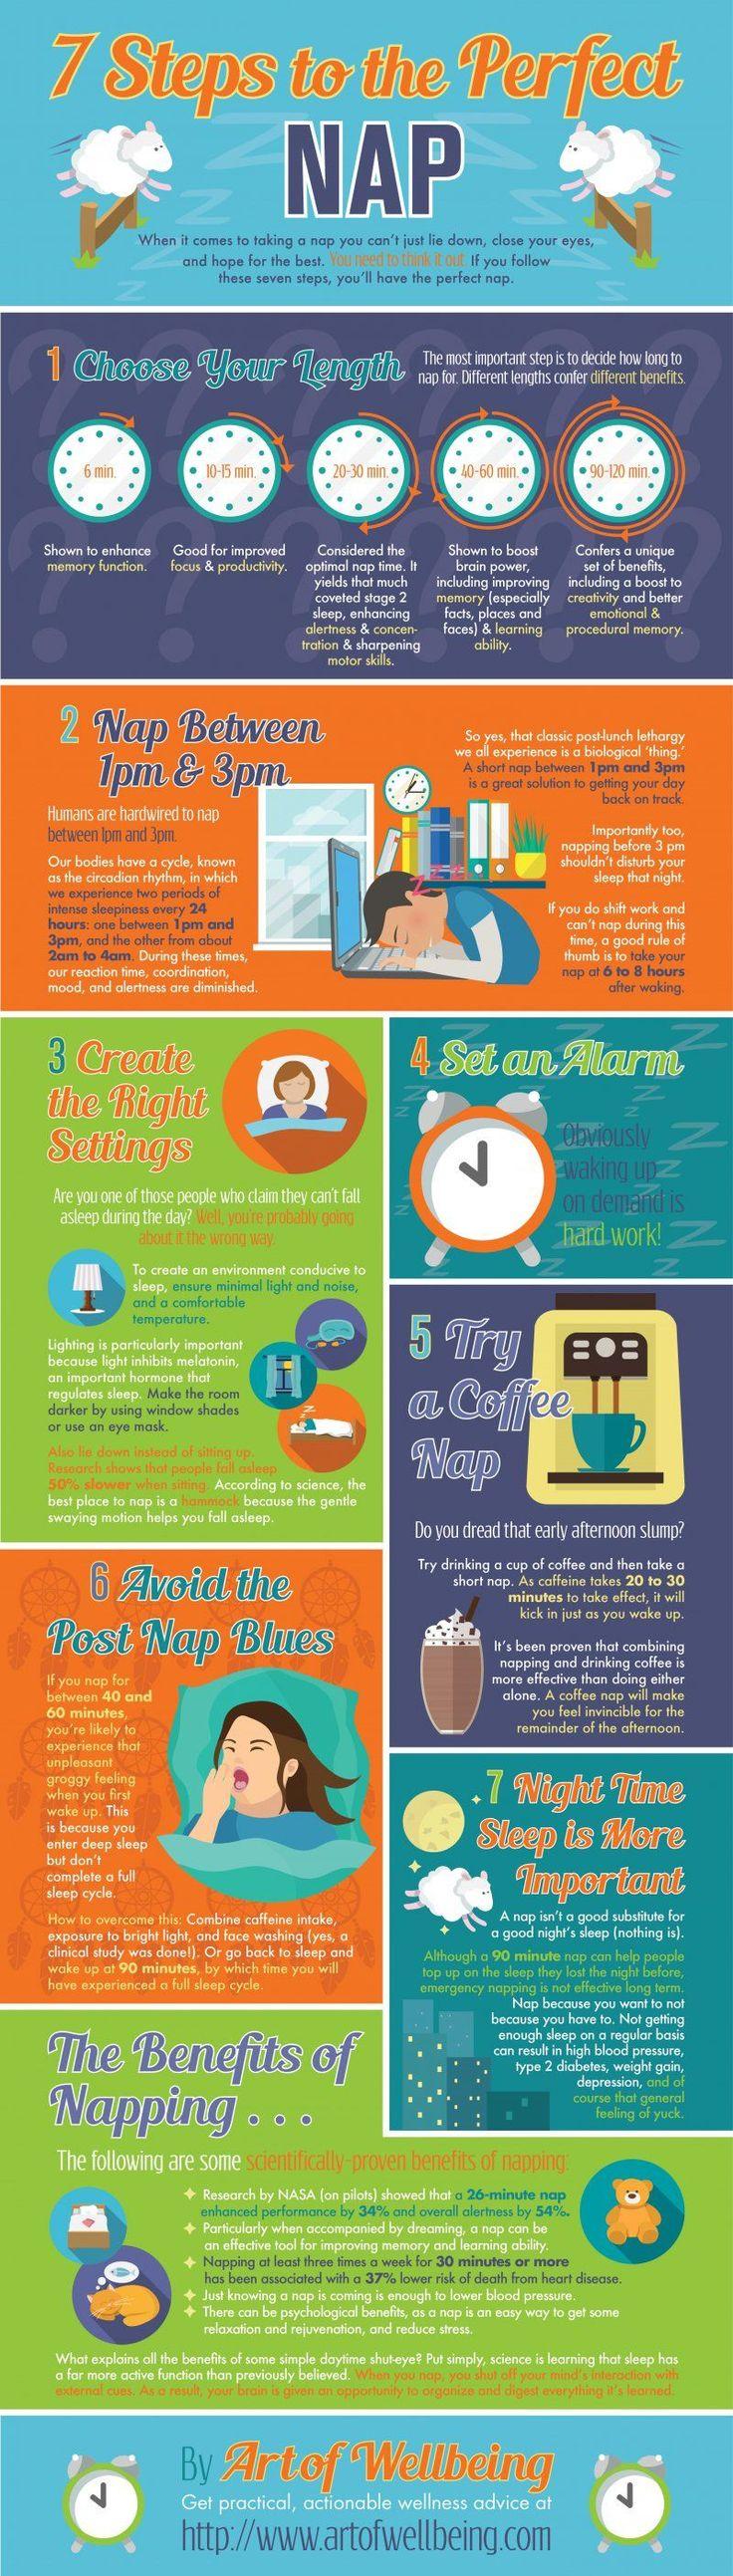 Have A Nap To Improve Productivity And Creativity How To Napsleep